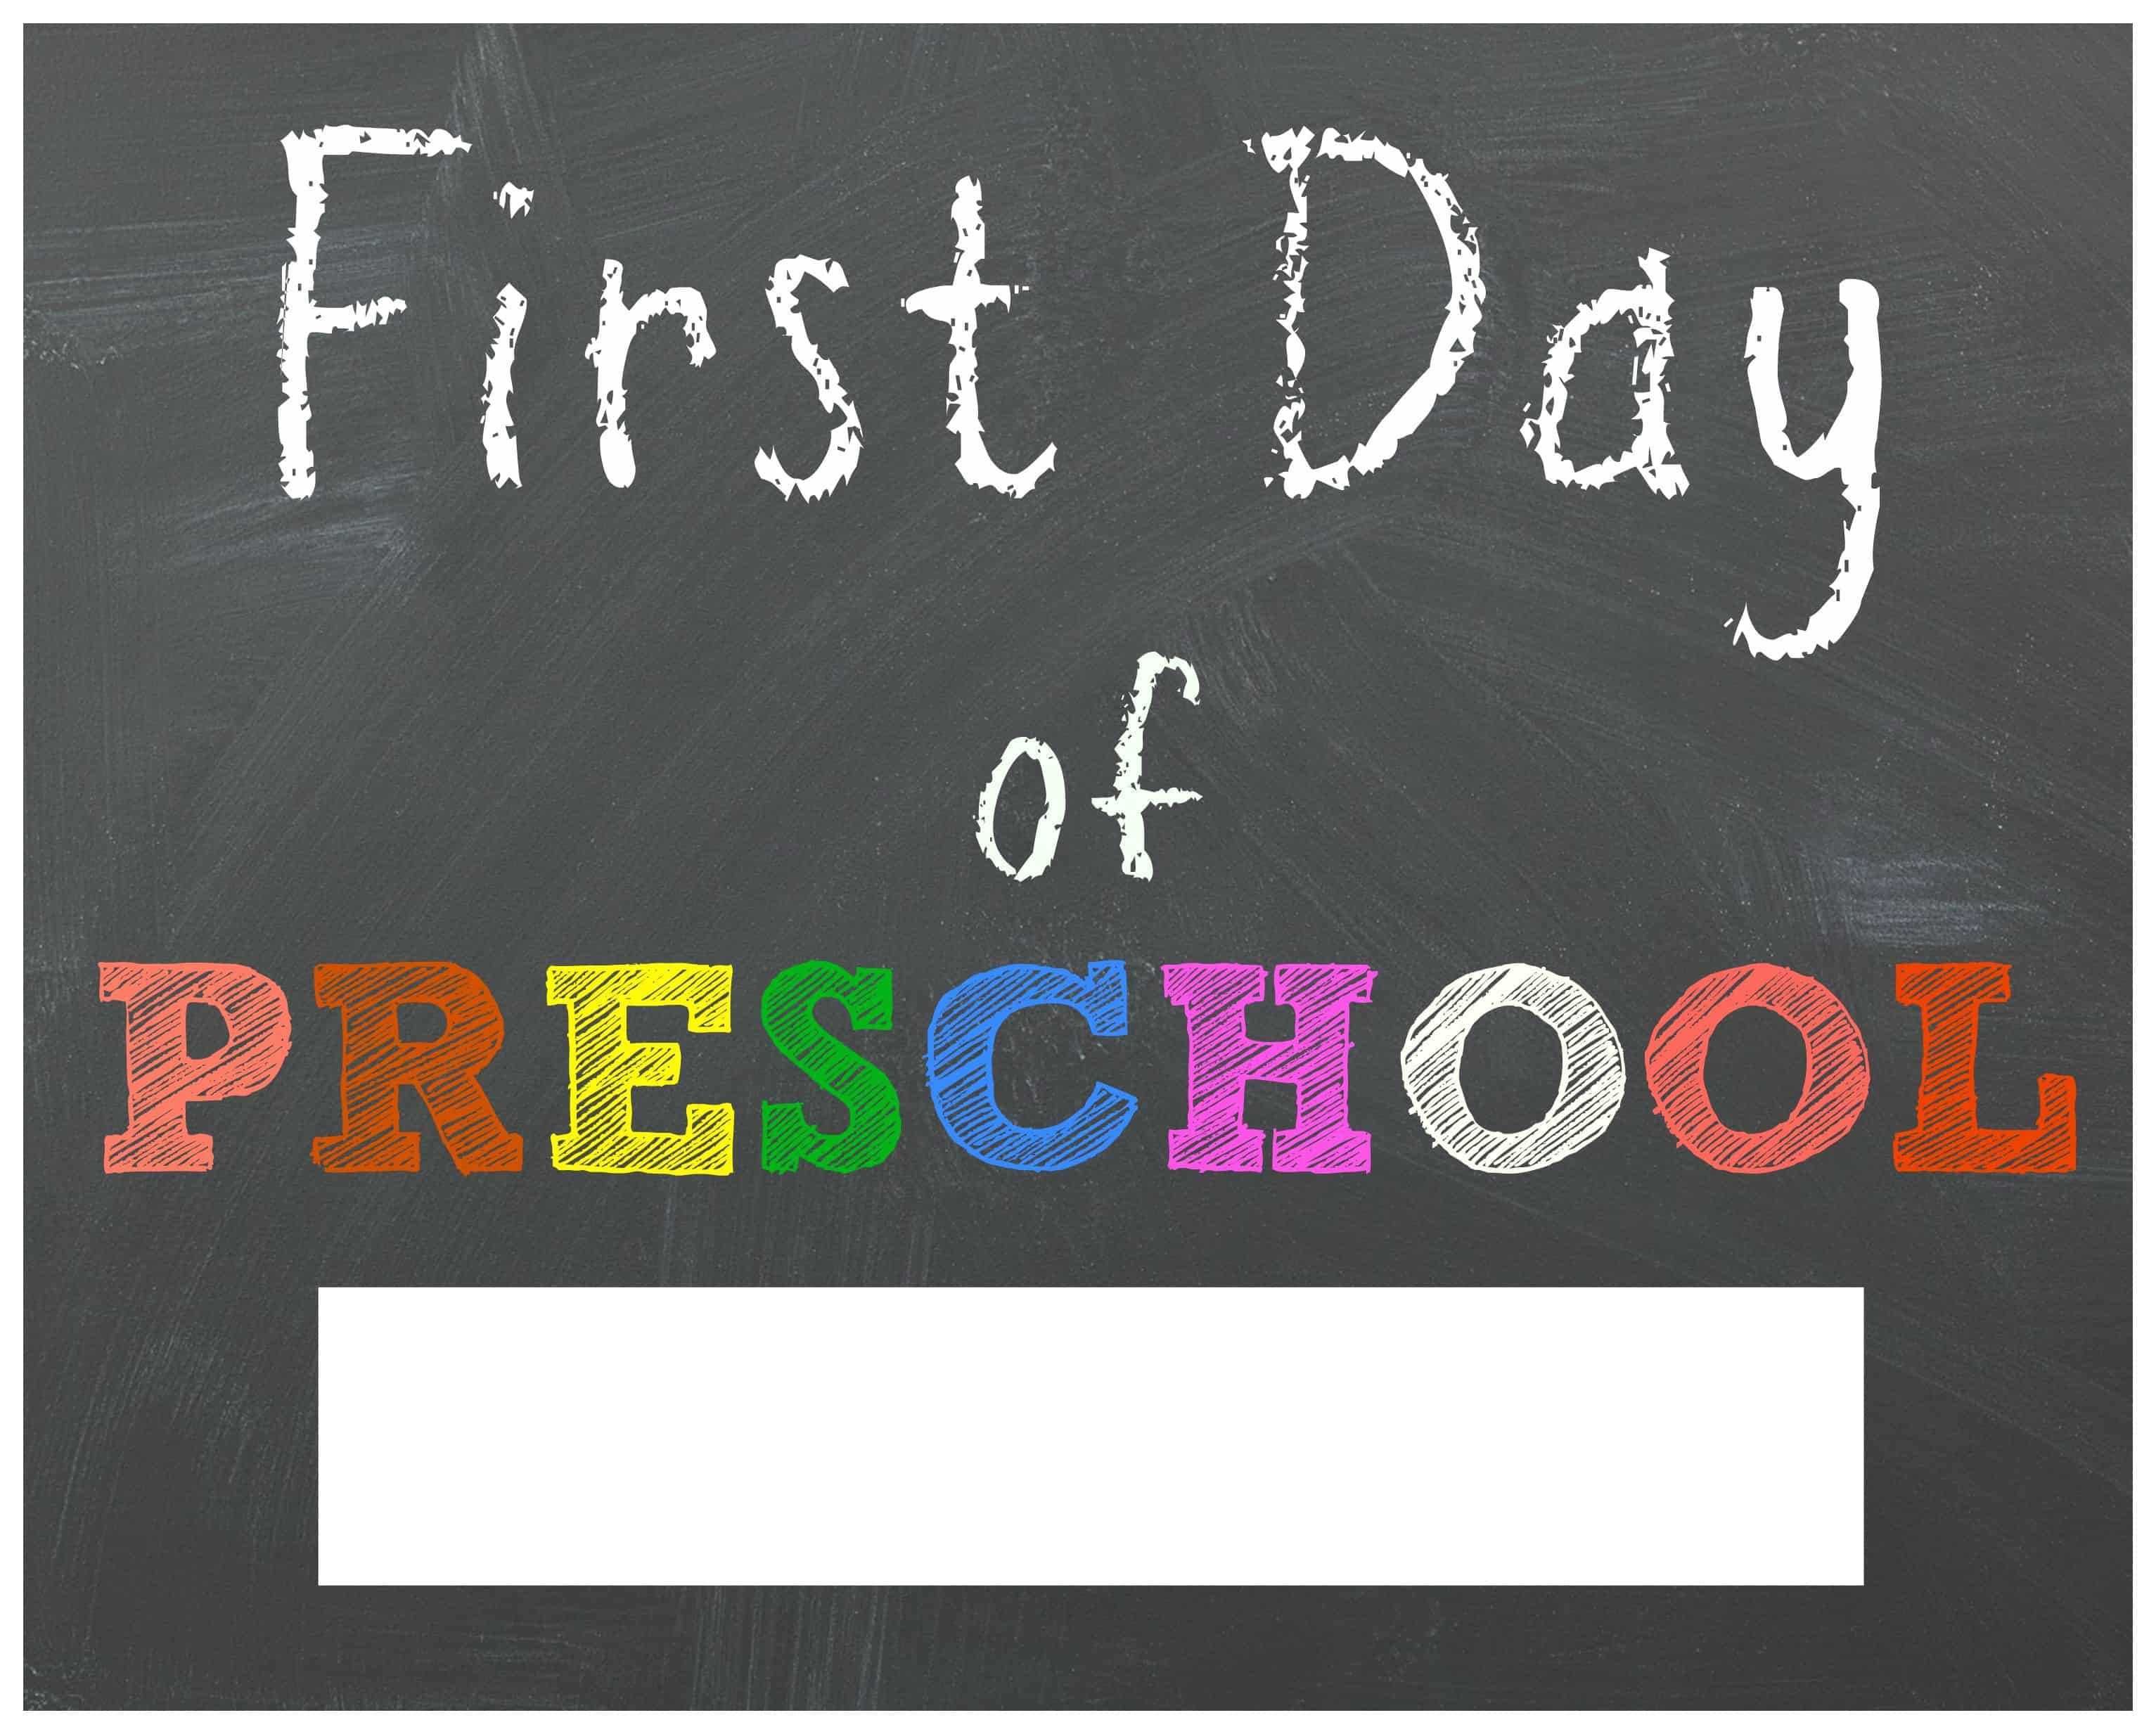 Free Back To School Printable Chalkboard Signs For First Day Of - Free Printable First Day Of School Chalkboard Signs